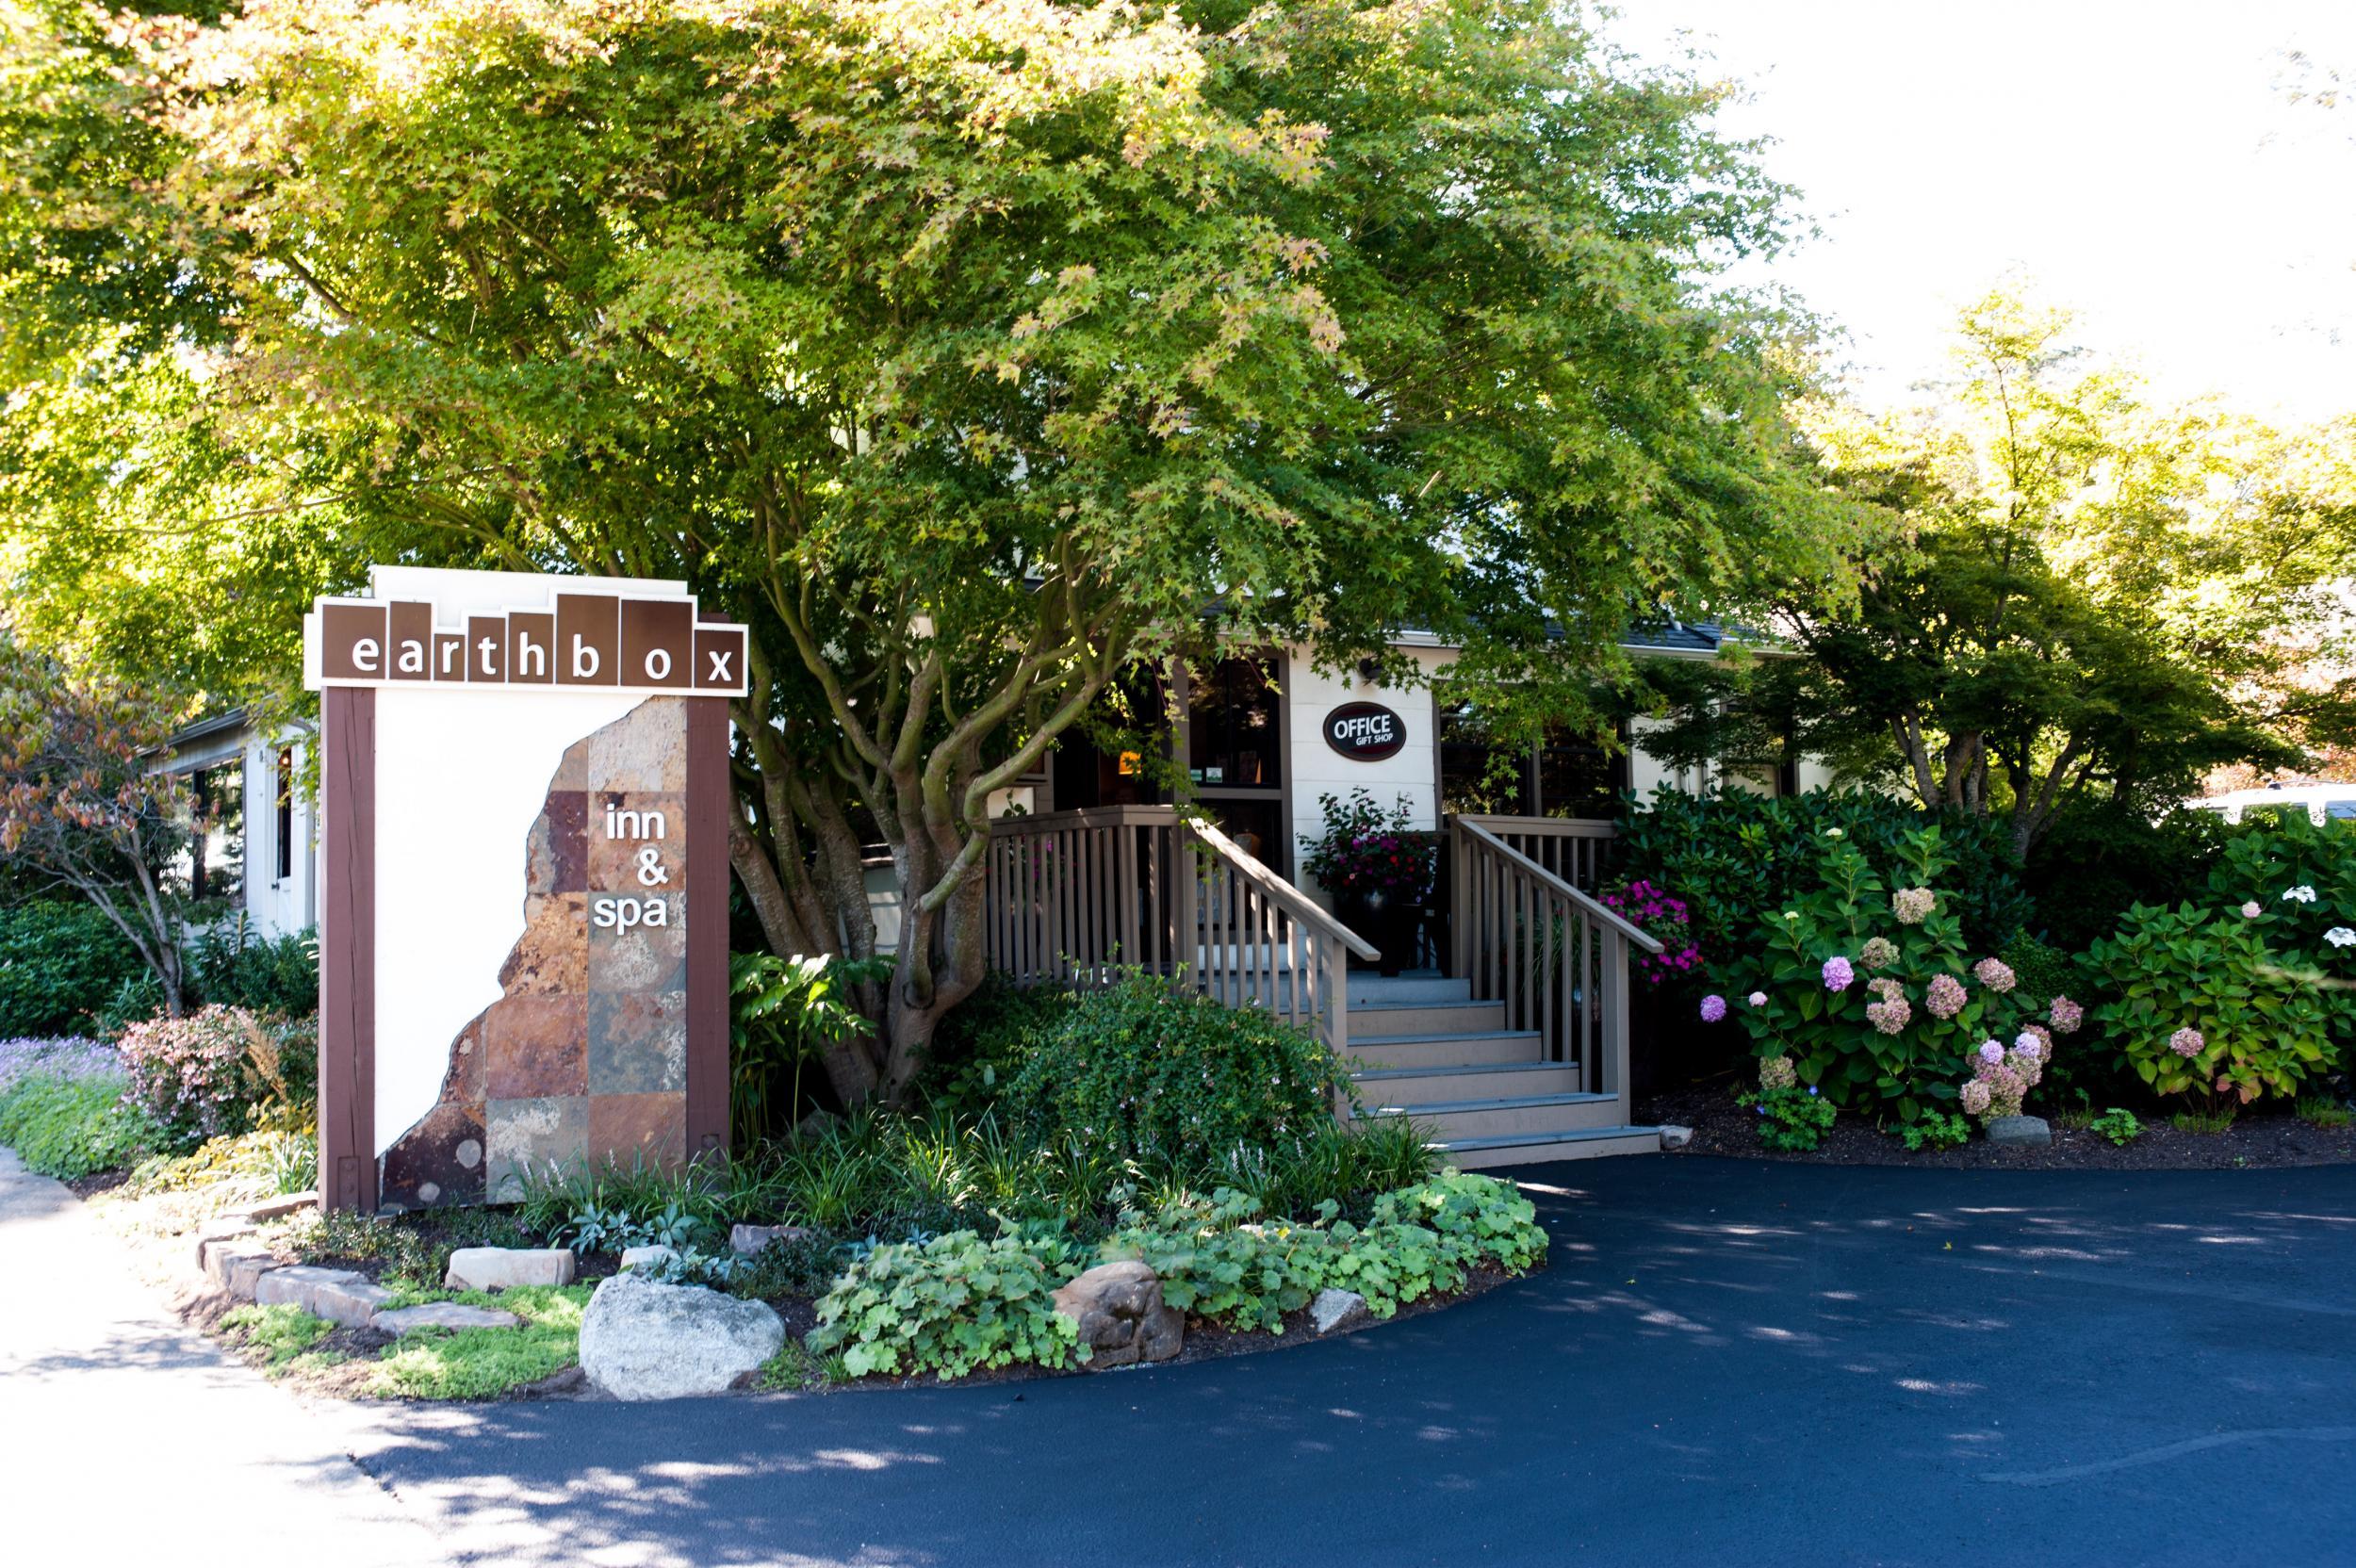 Earthbox Inn & Spa on San Juan Island